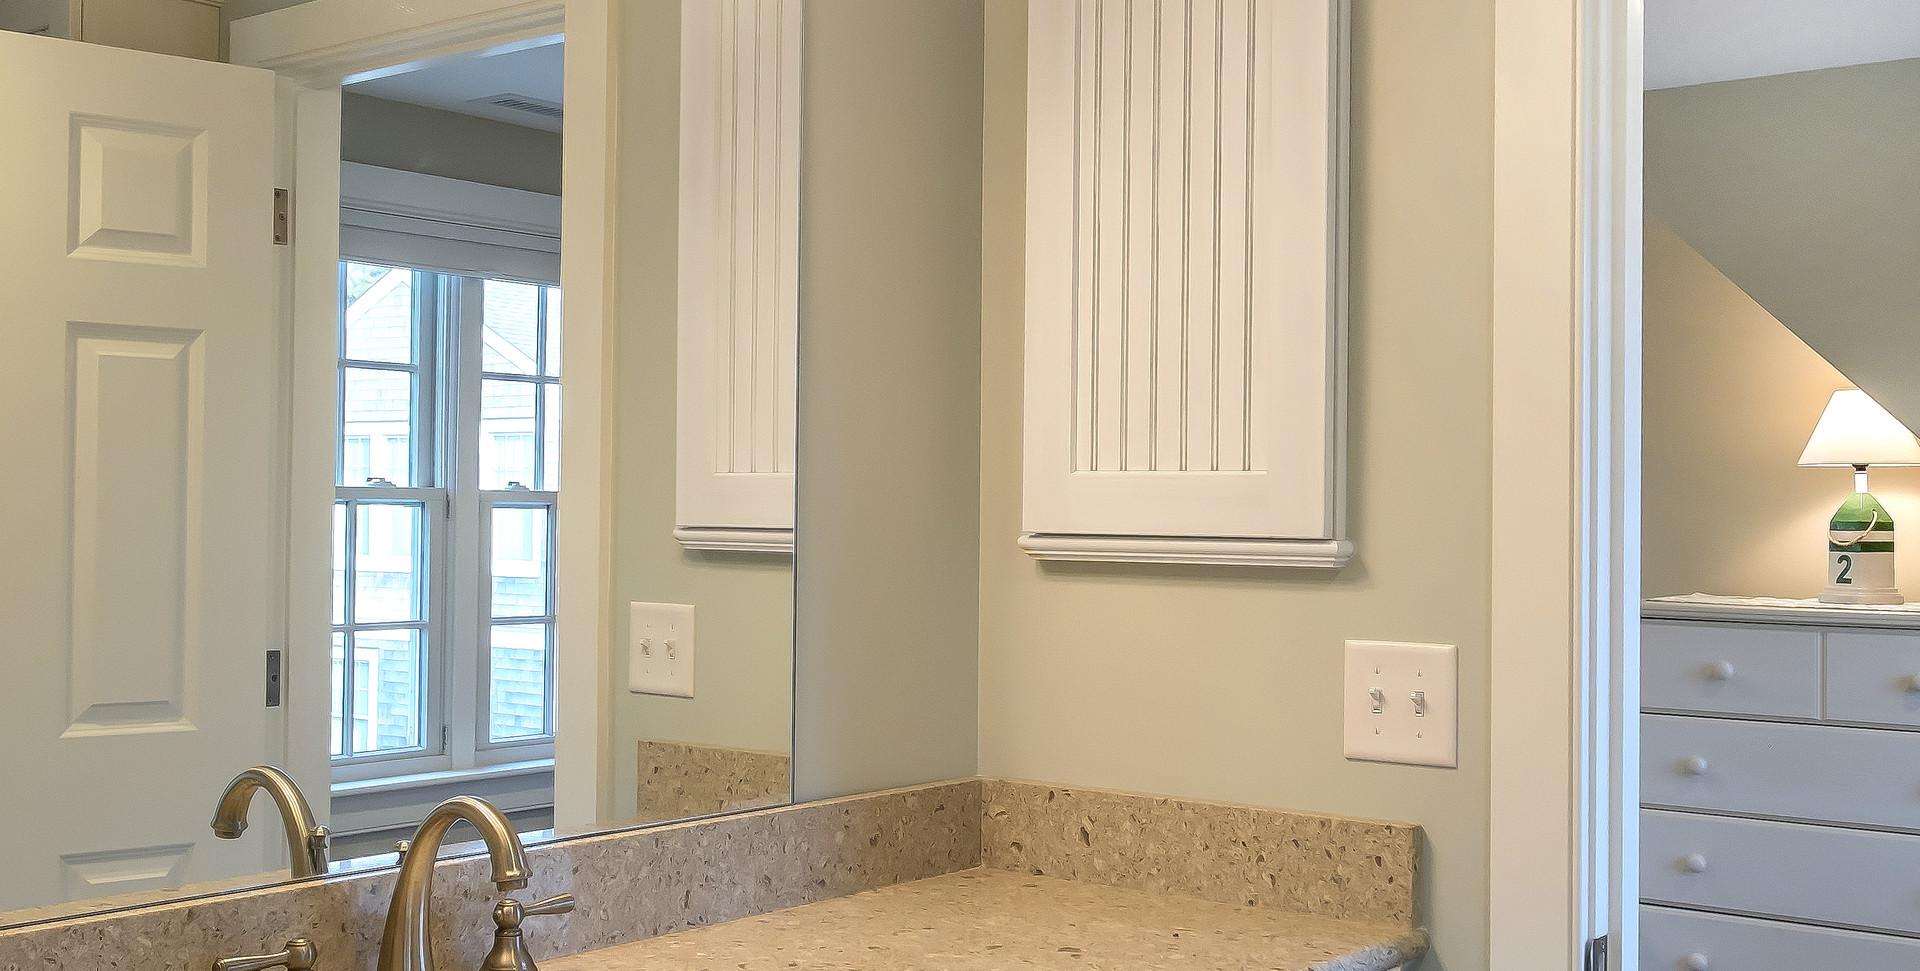 Ridgevale Beach, West Chatham, MA, Home Remodel, Cape Cod bathroom remodel